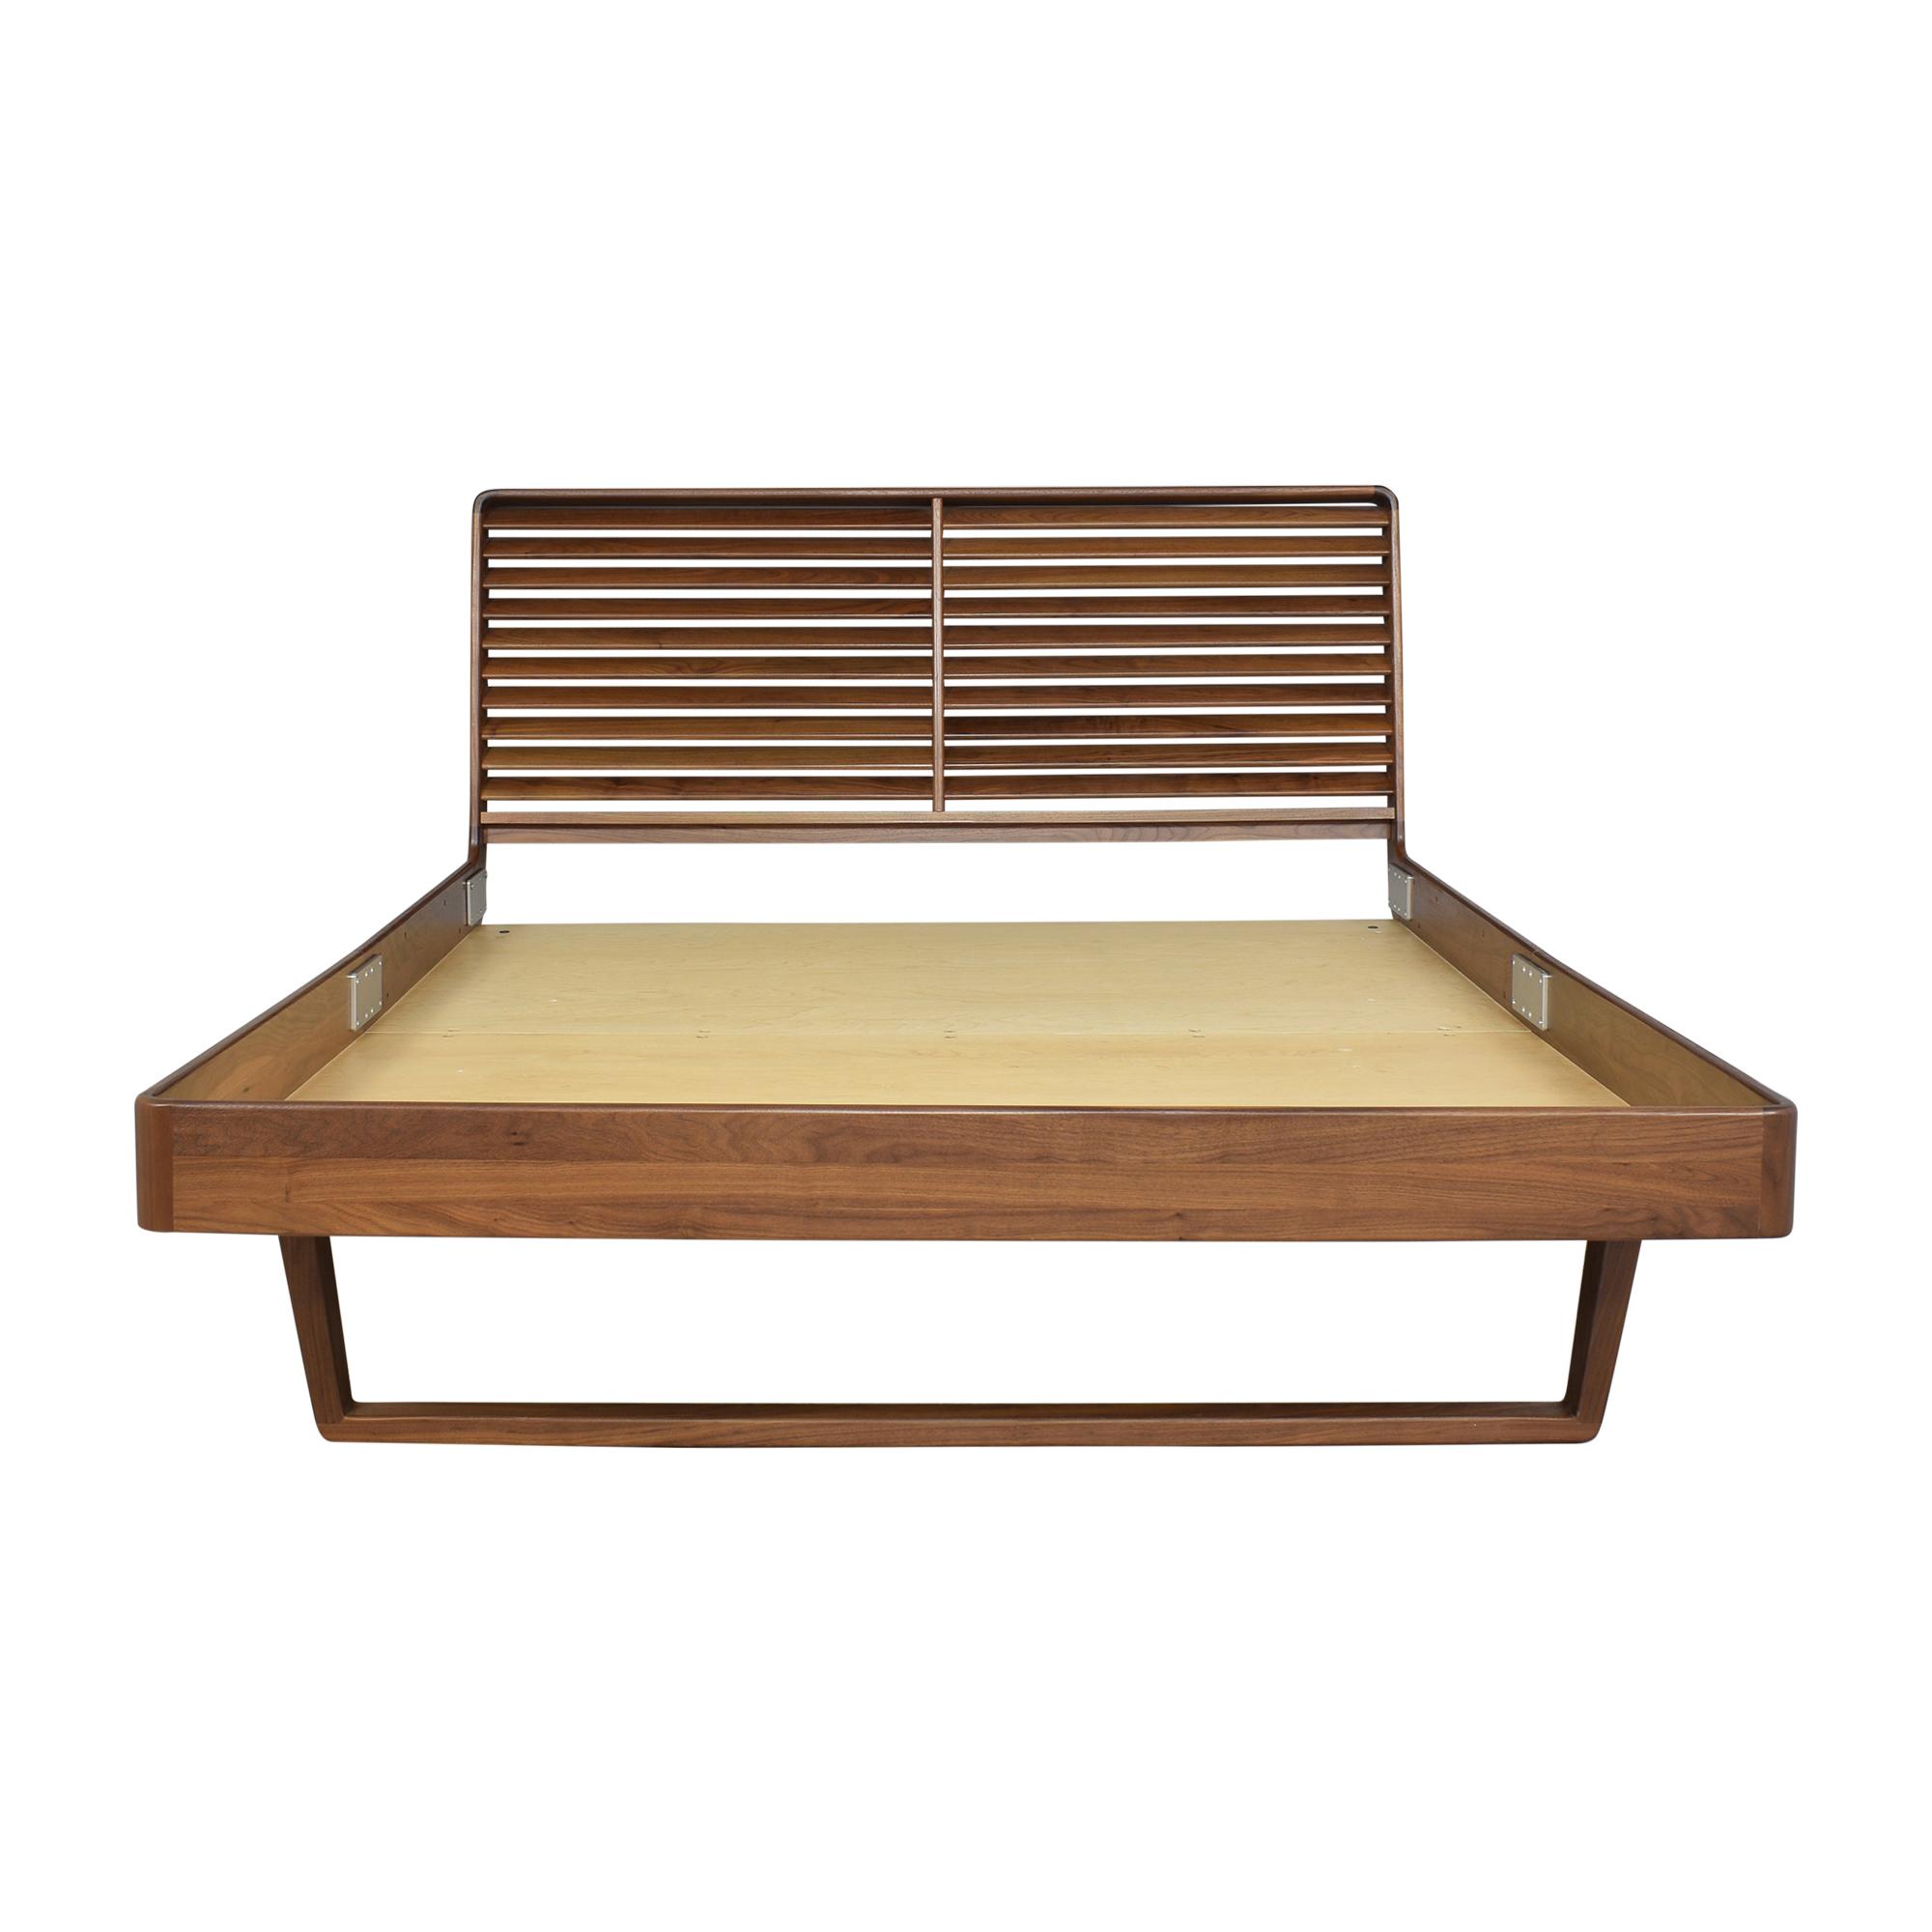 Copeland Furniture Copeland Furniture Queen Contour Platform Bed second hand